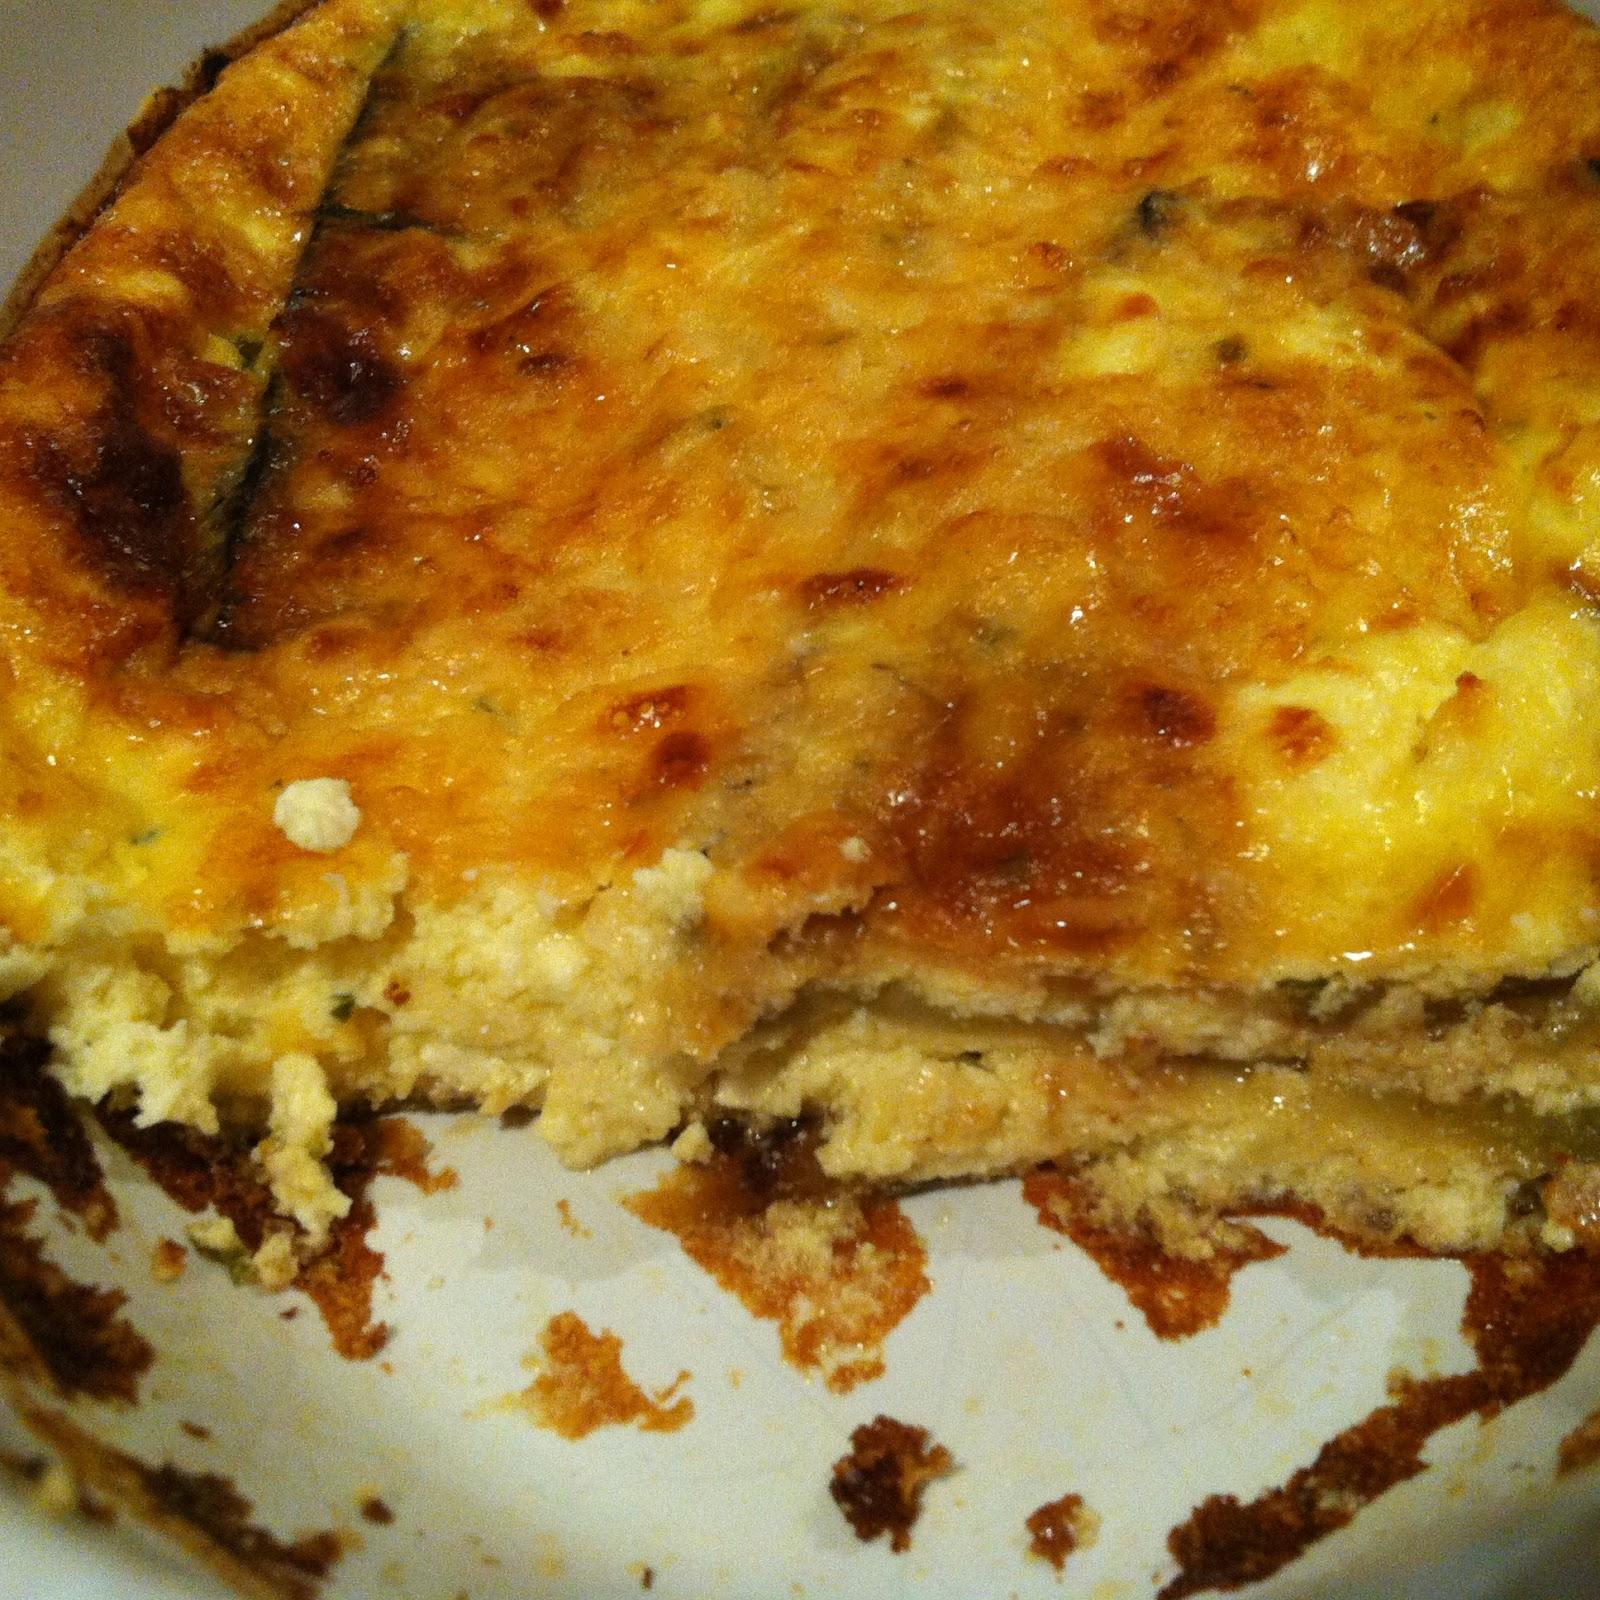 WWDH - Eggplant, Ricotta, Parmesan Bake | Laws of the Kitchen